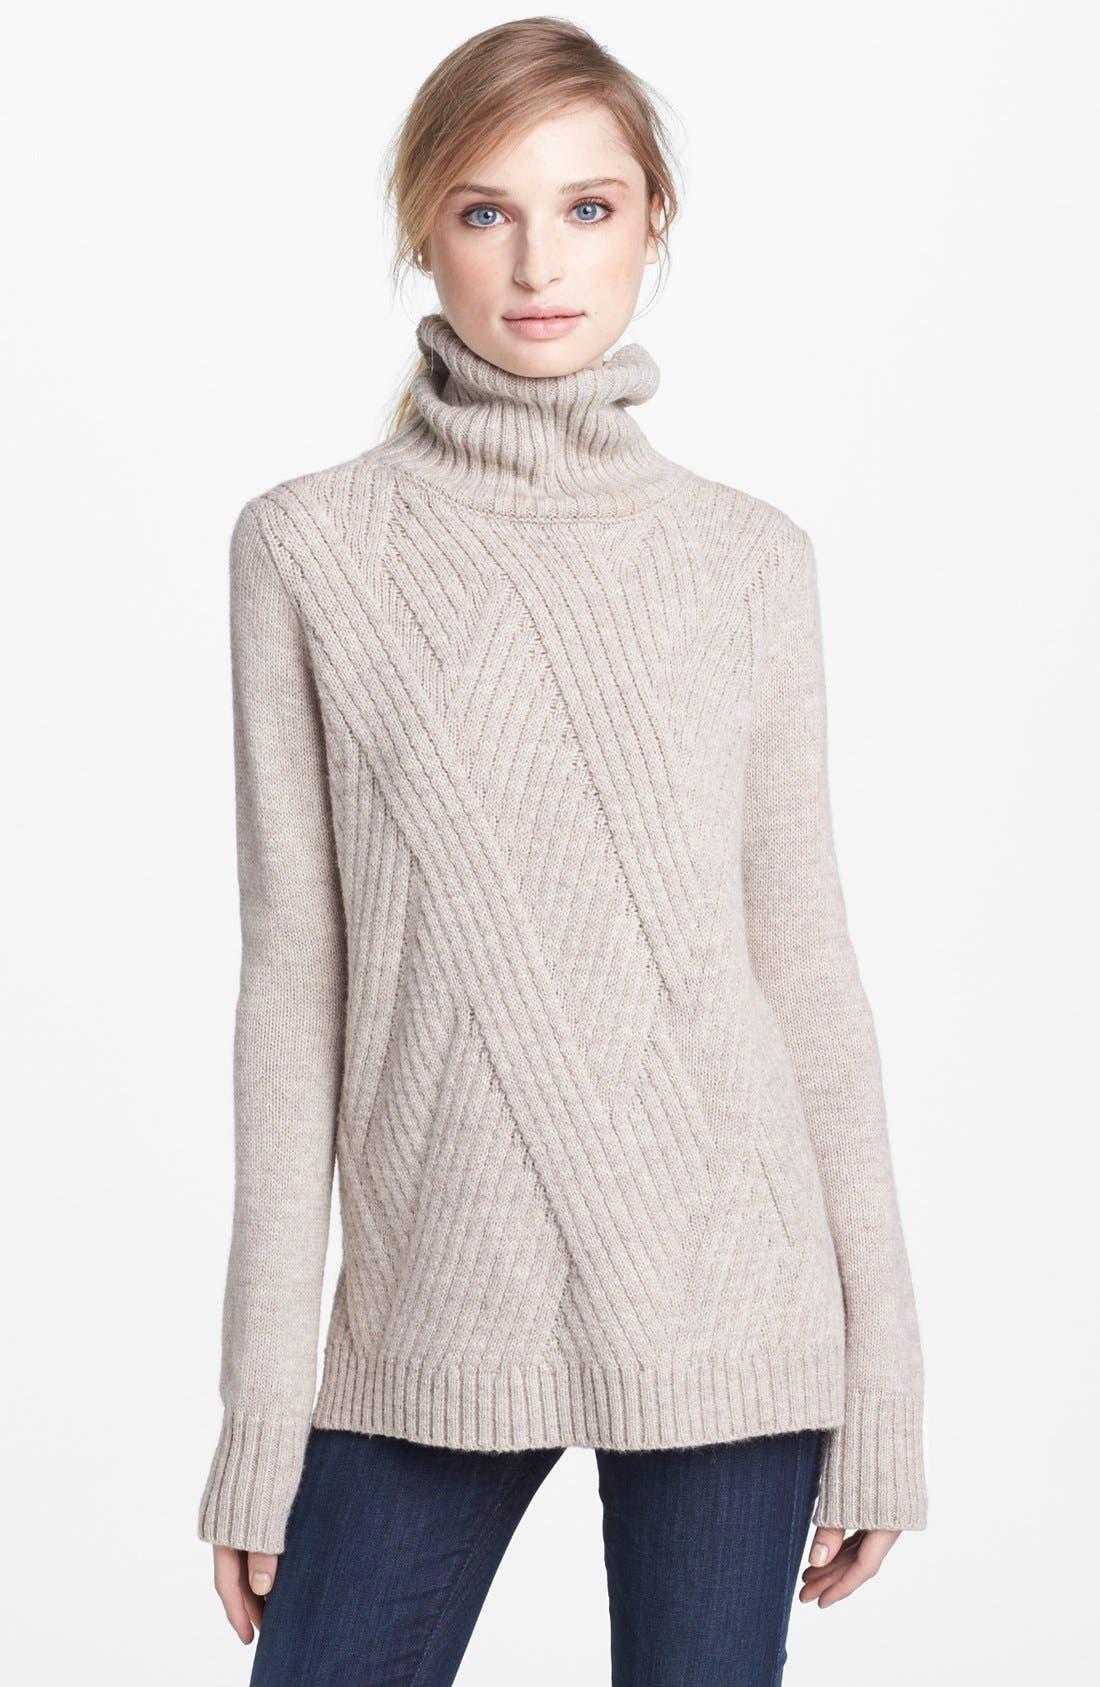 Main Image - Vince 'Travelling' Ribbed Turtleneck Sweater